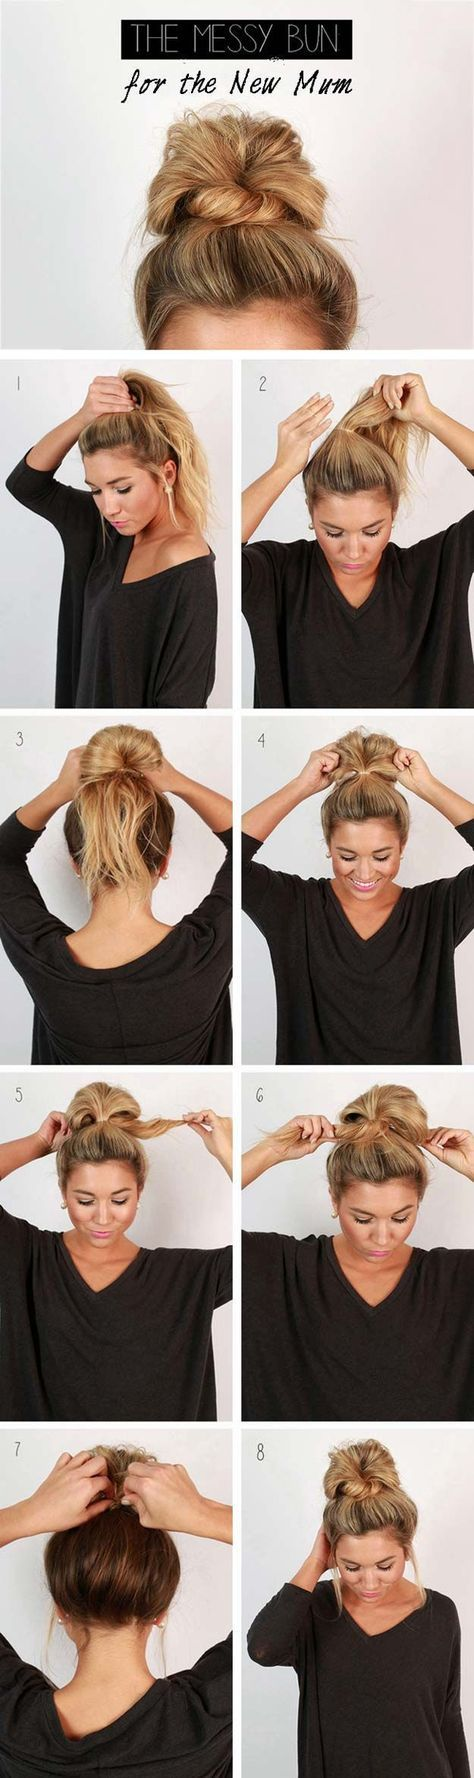 The 25+ best Easy diy hairstyles ideas on Pinterest | Diy ...